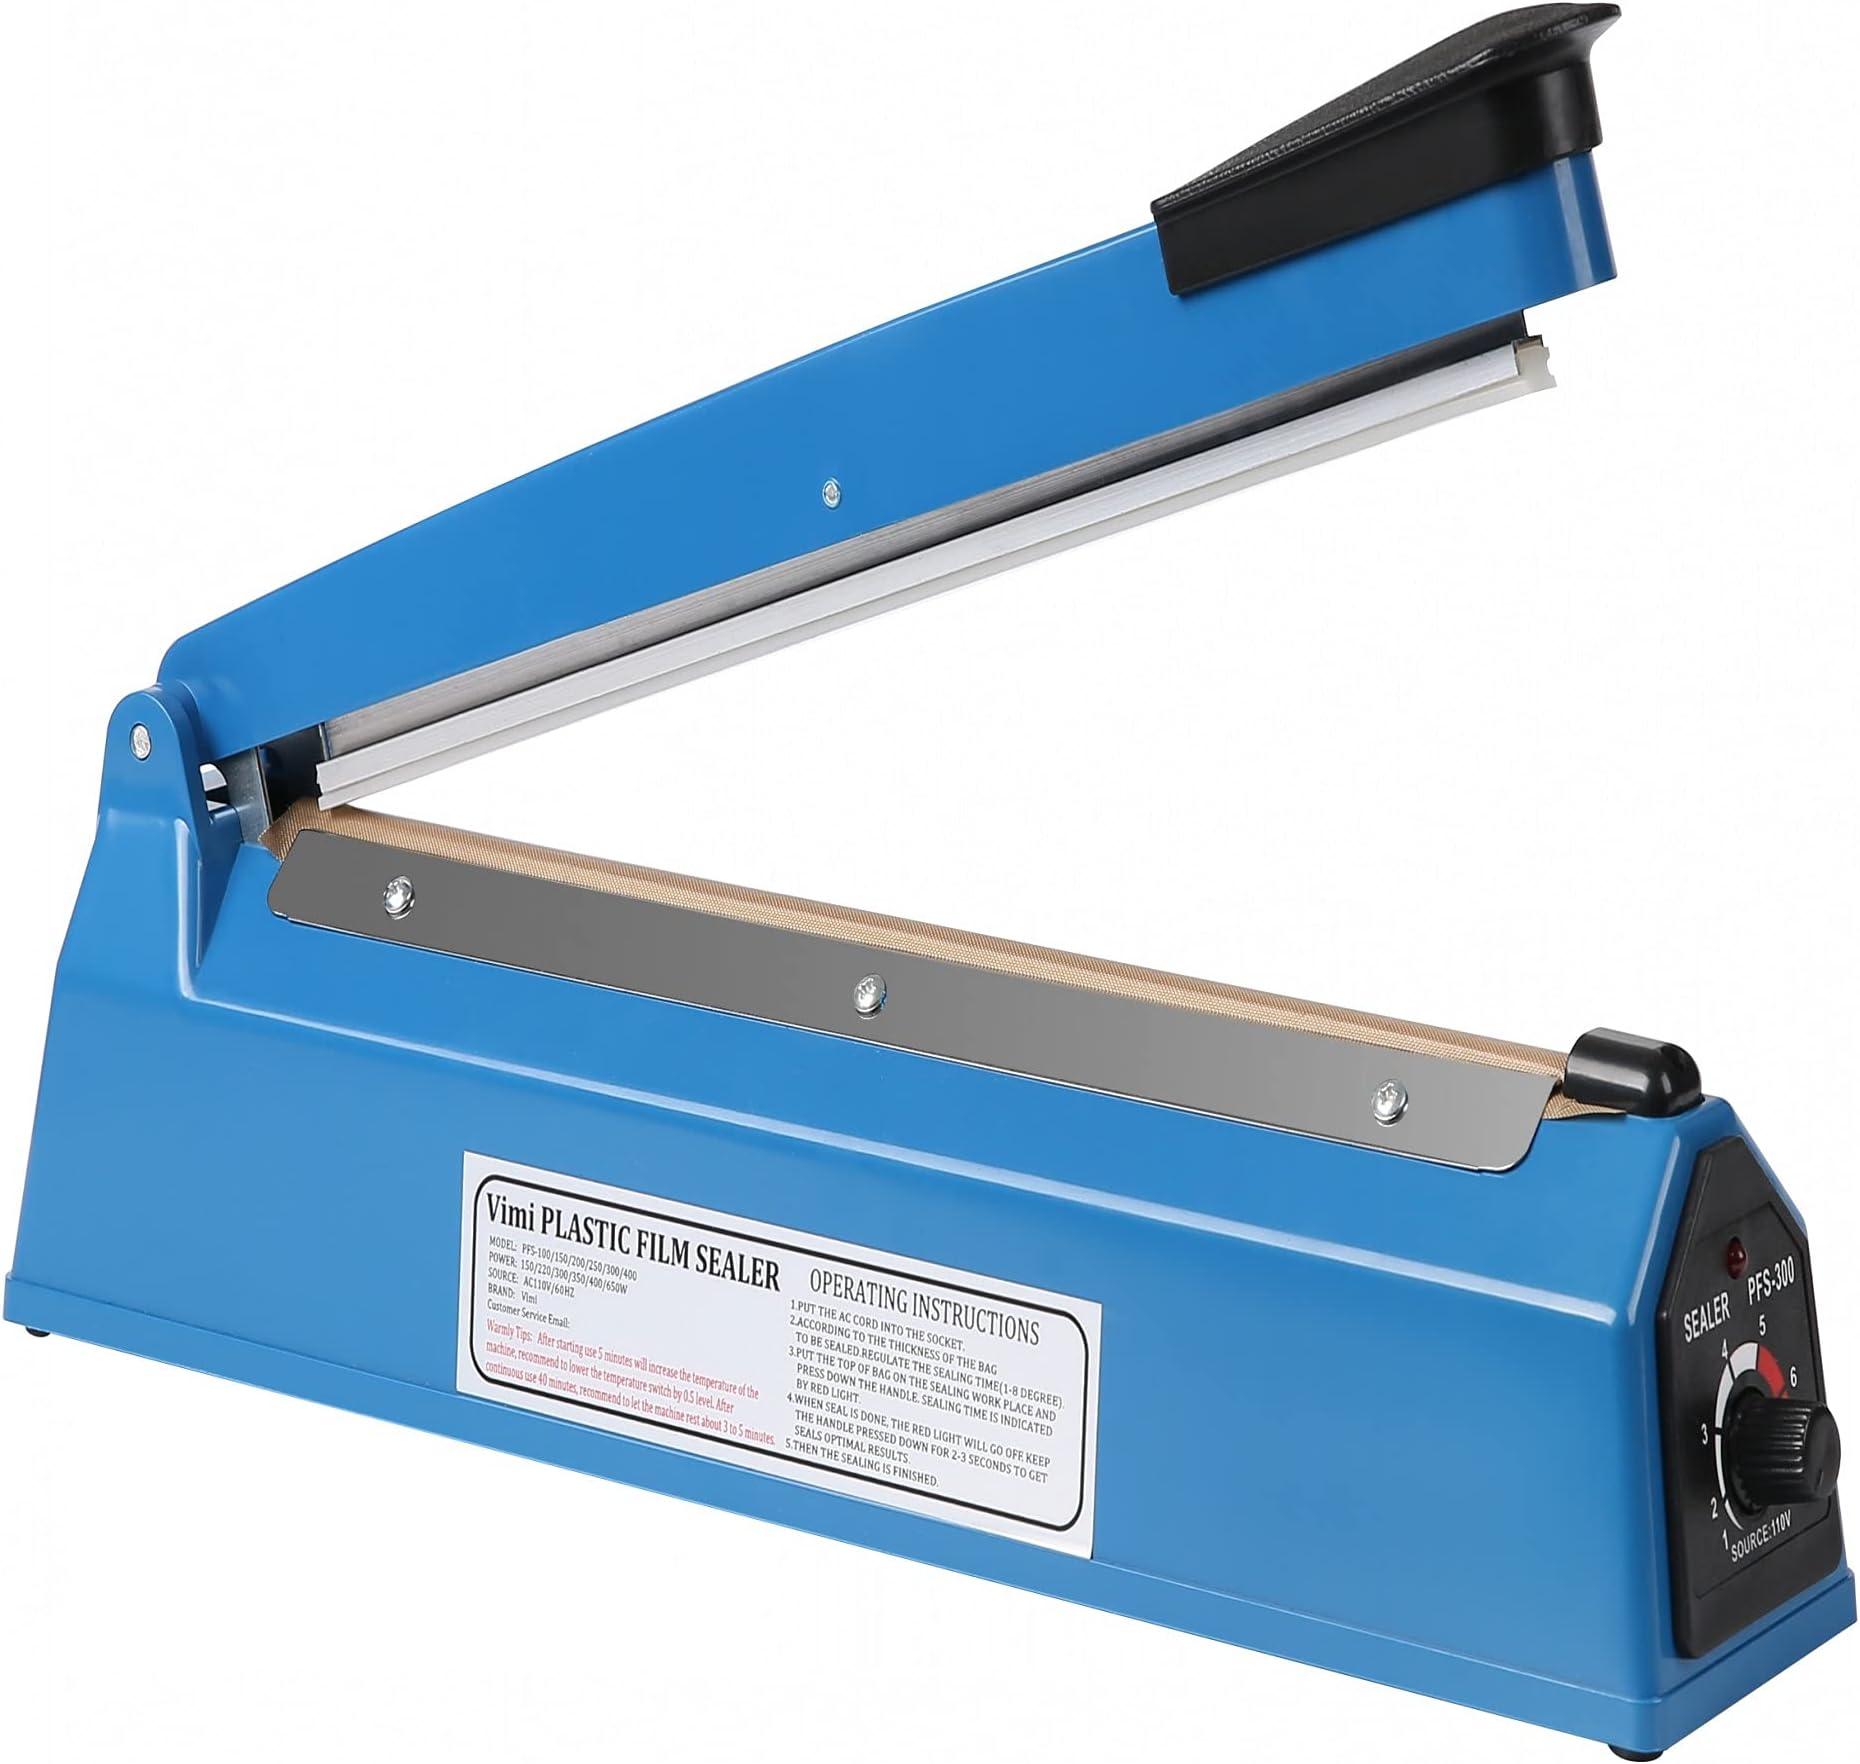 Impulse Heat Sealer Manual Bags Sealer Heat Sealing Machine 8 Inch Impulse Sealer Machine for Plastic Bags PE PP Bags with Extra Replace Element Grip